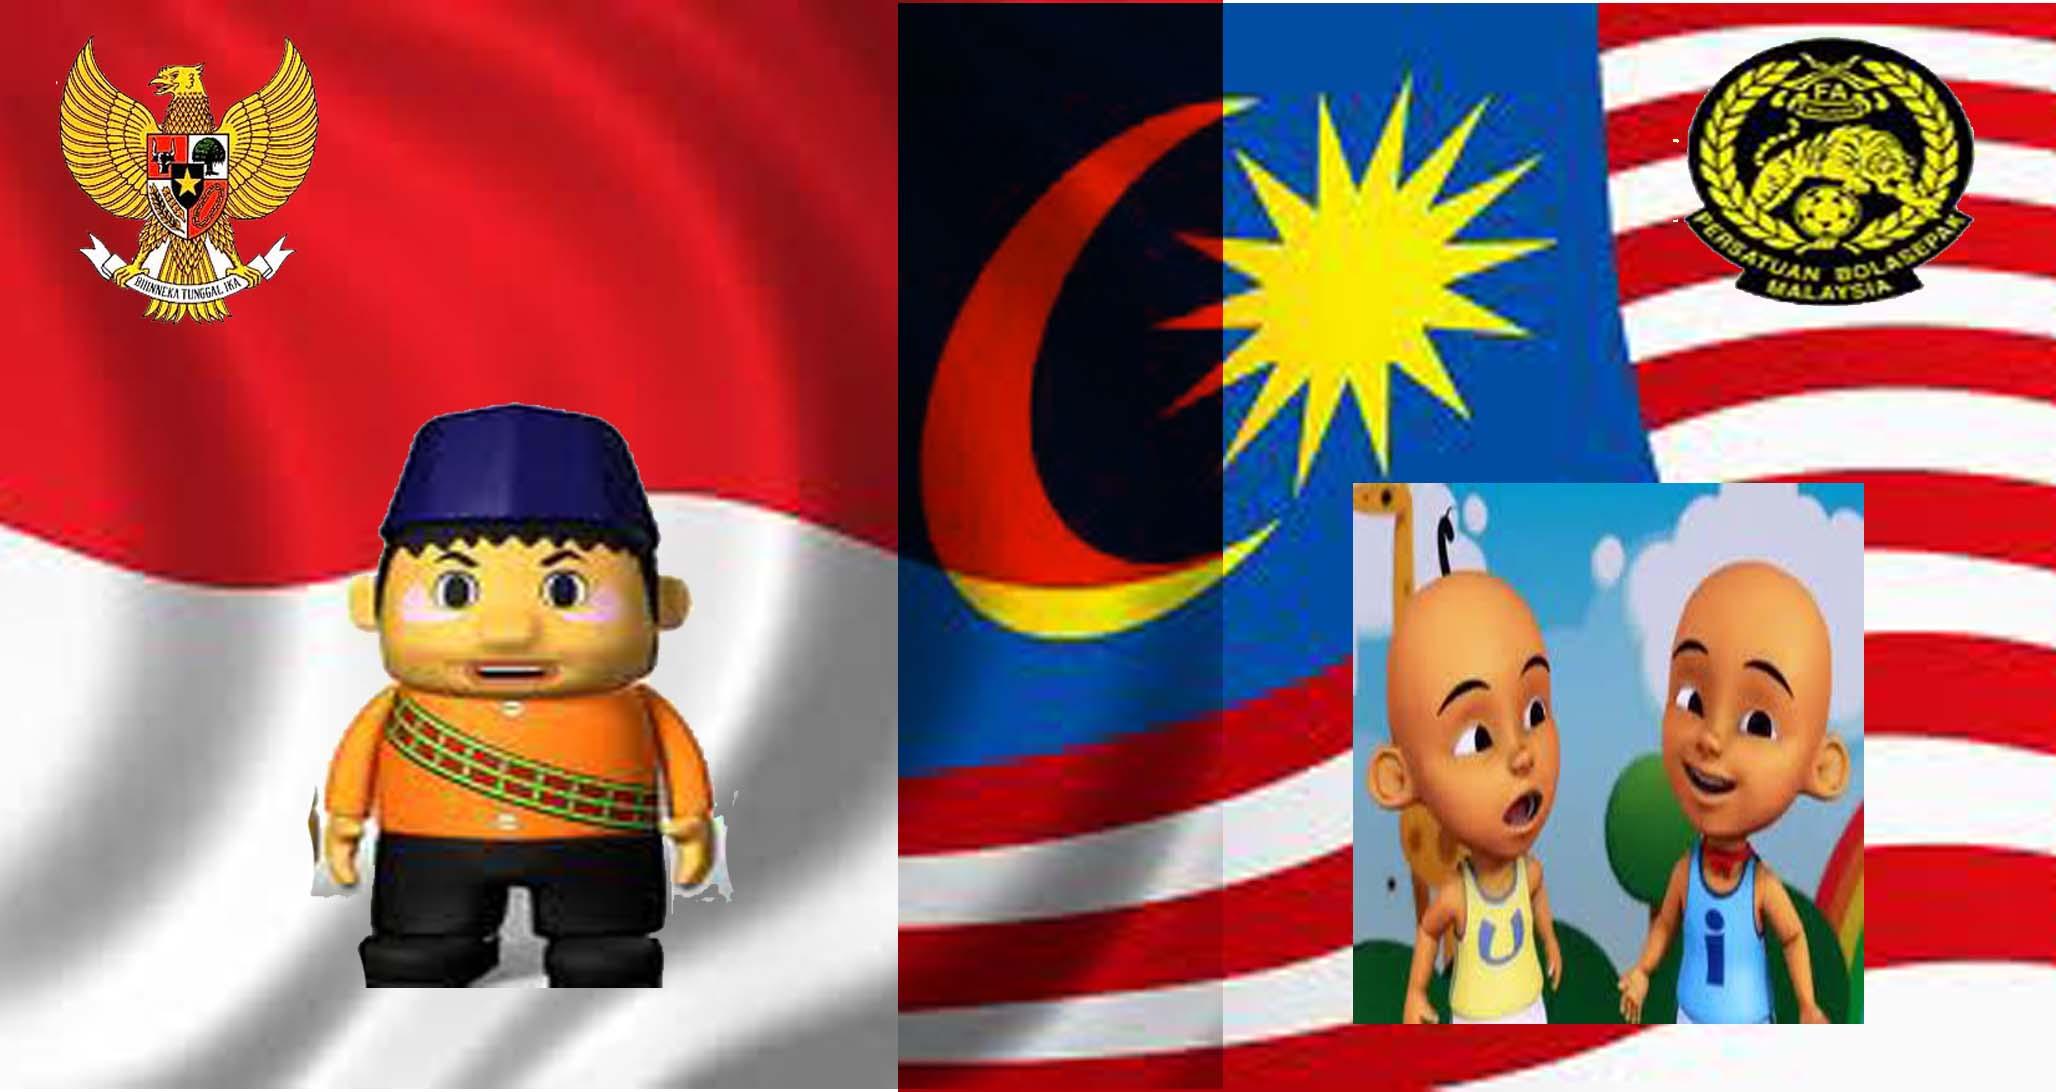 http://mabrurisirampog.files.wordpress.com/2010/12/ina-vs-malays.jpg